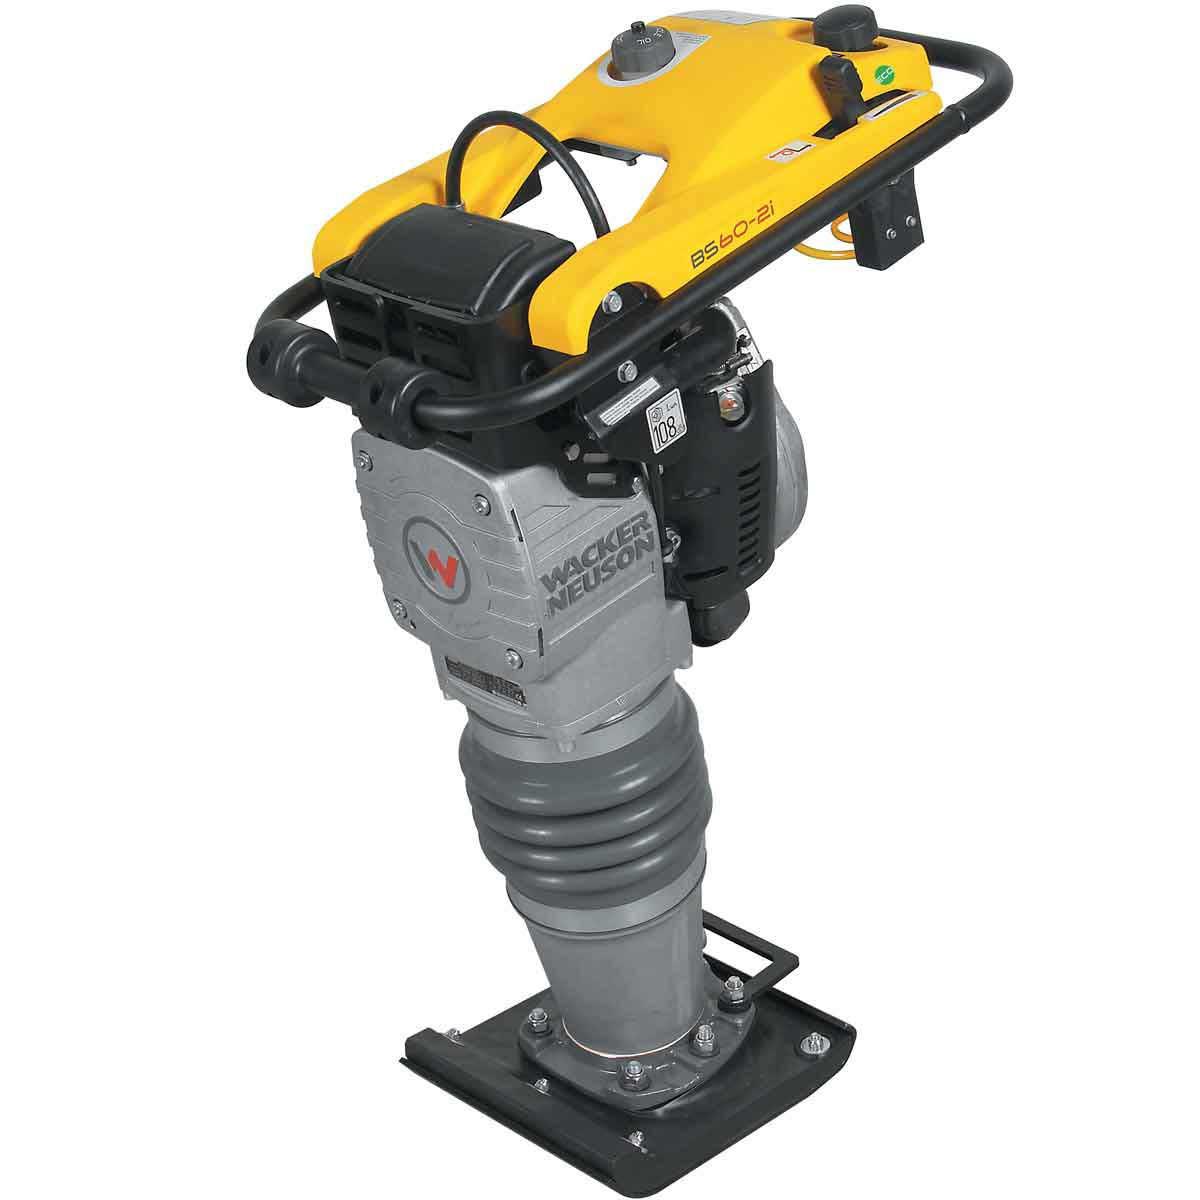 Wacker Neuson BS60-2i Vibratory Rammer